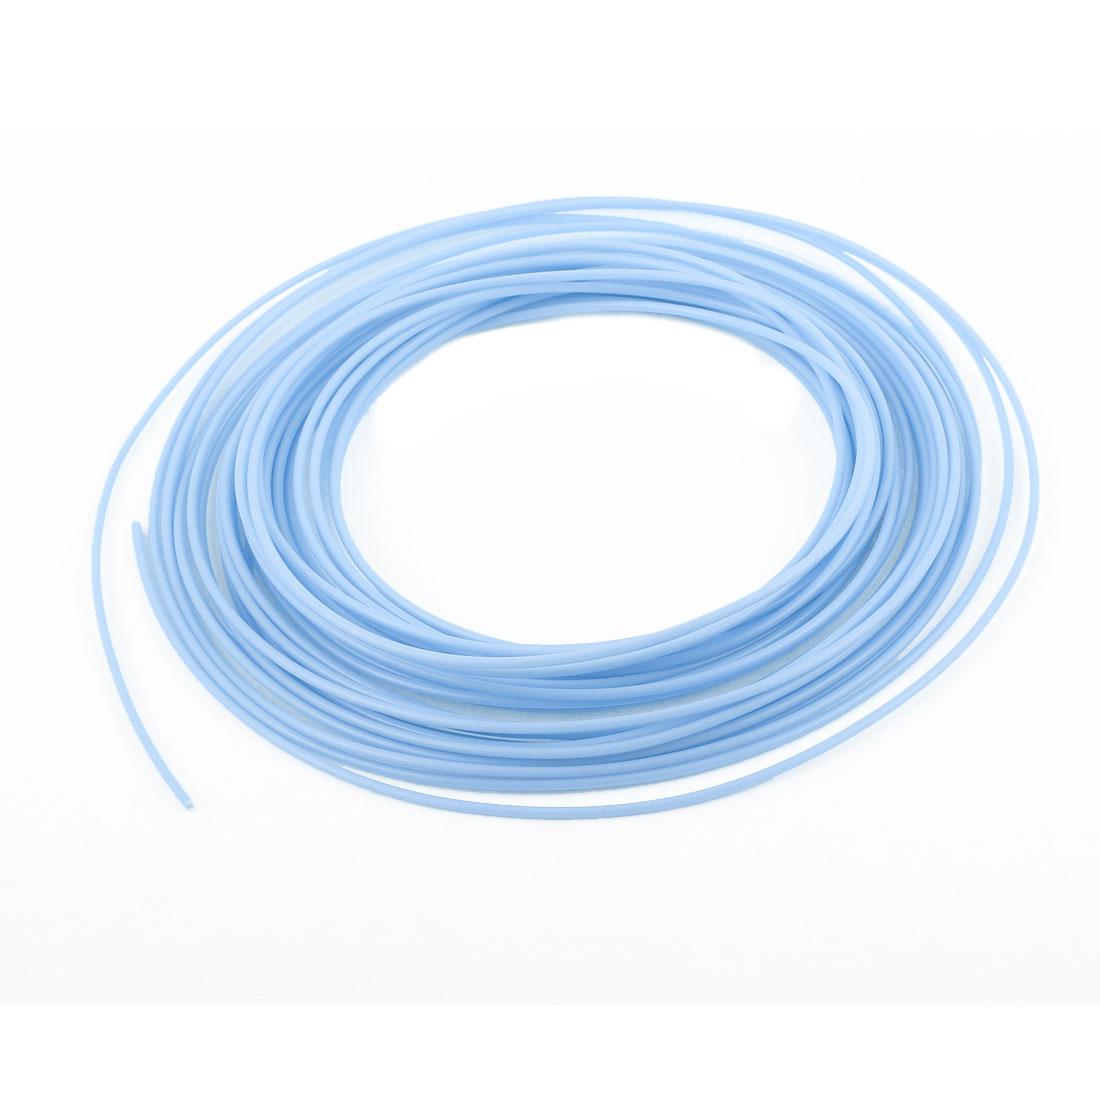 10m 3D Printer Pen Painting Filament Refills ABS Printing Material Light Blue